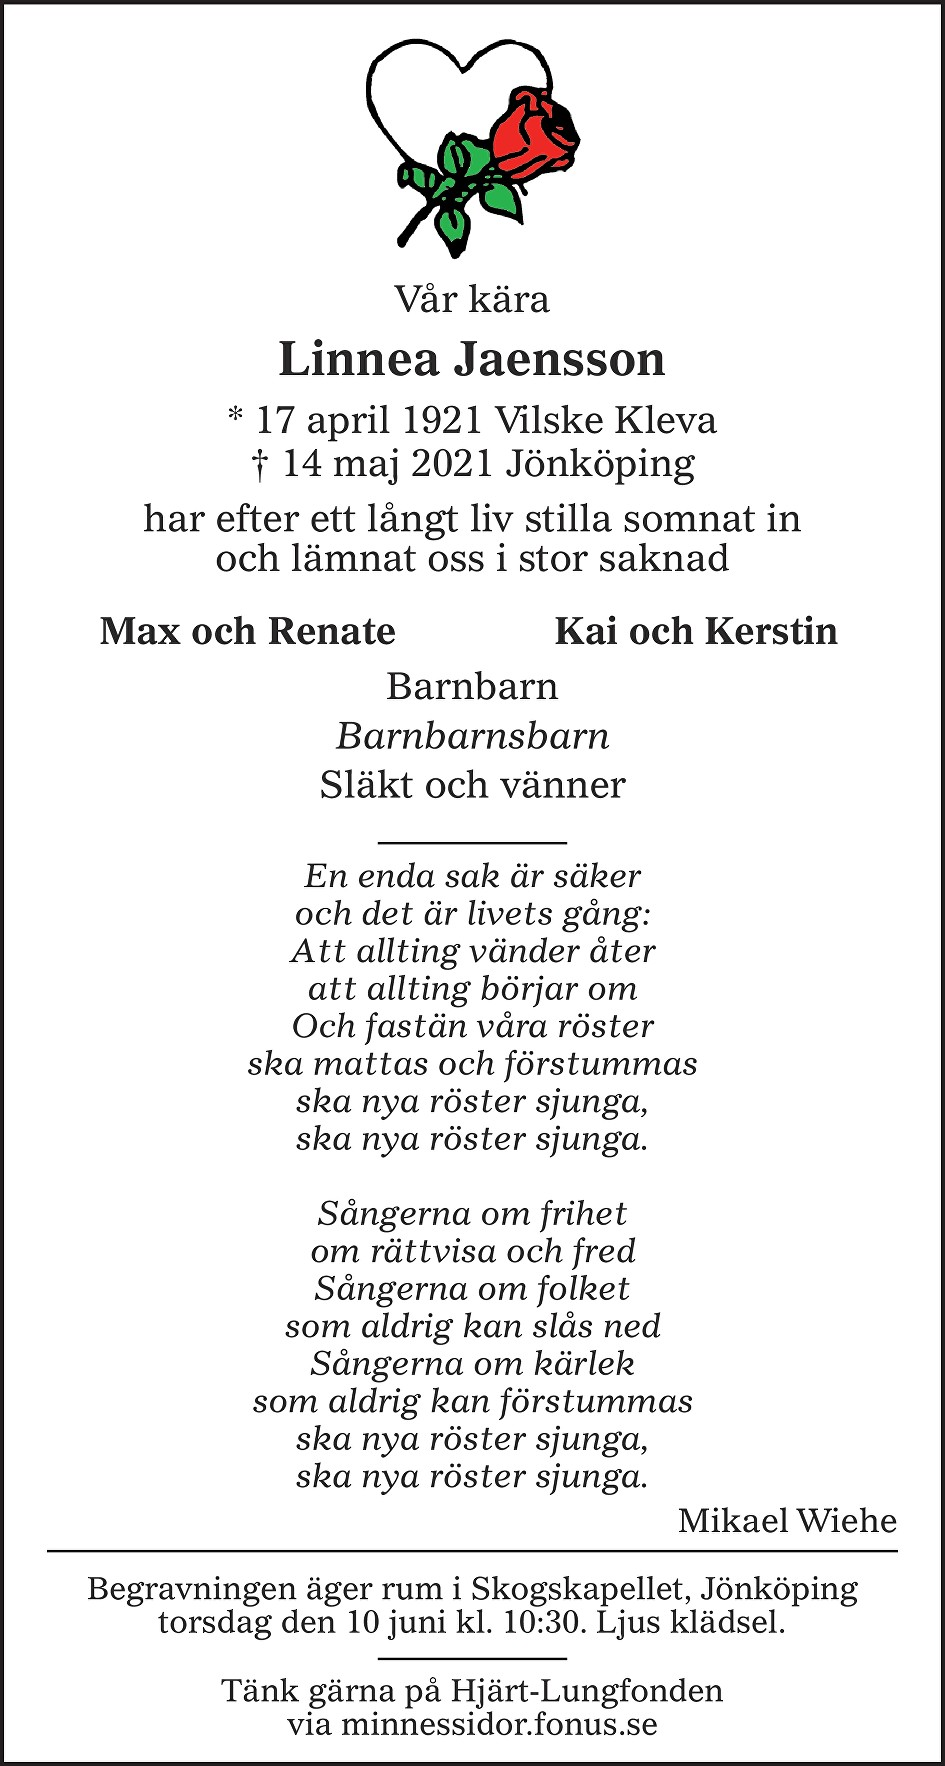 Linnea Jaensson Death notice